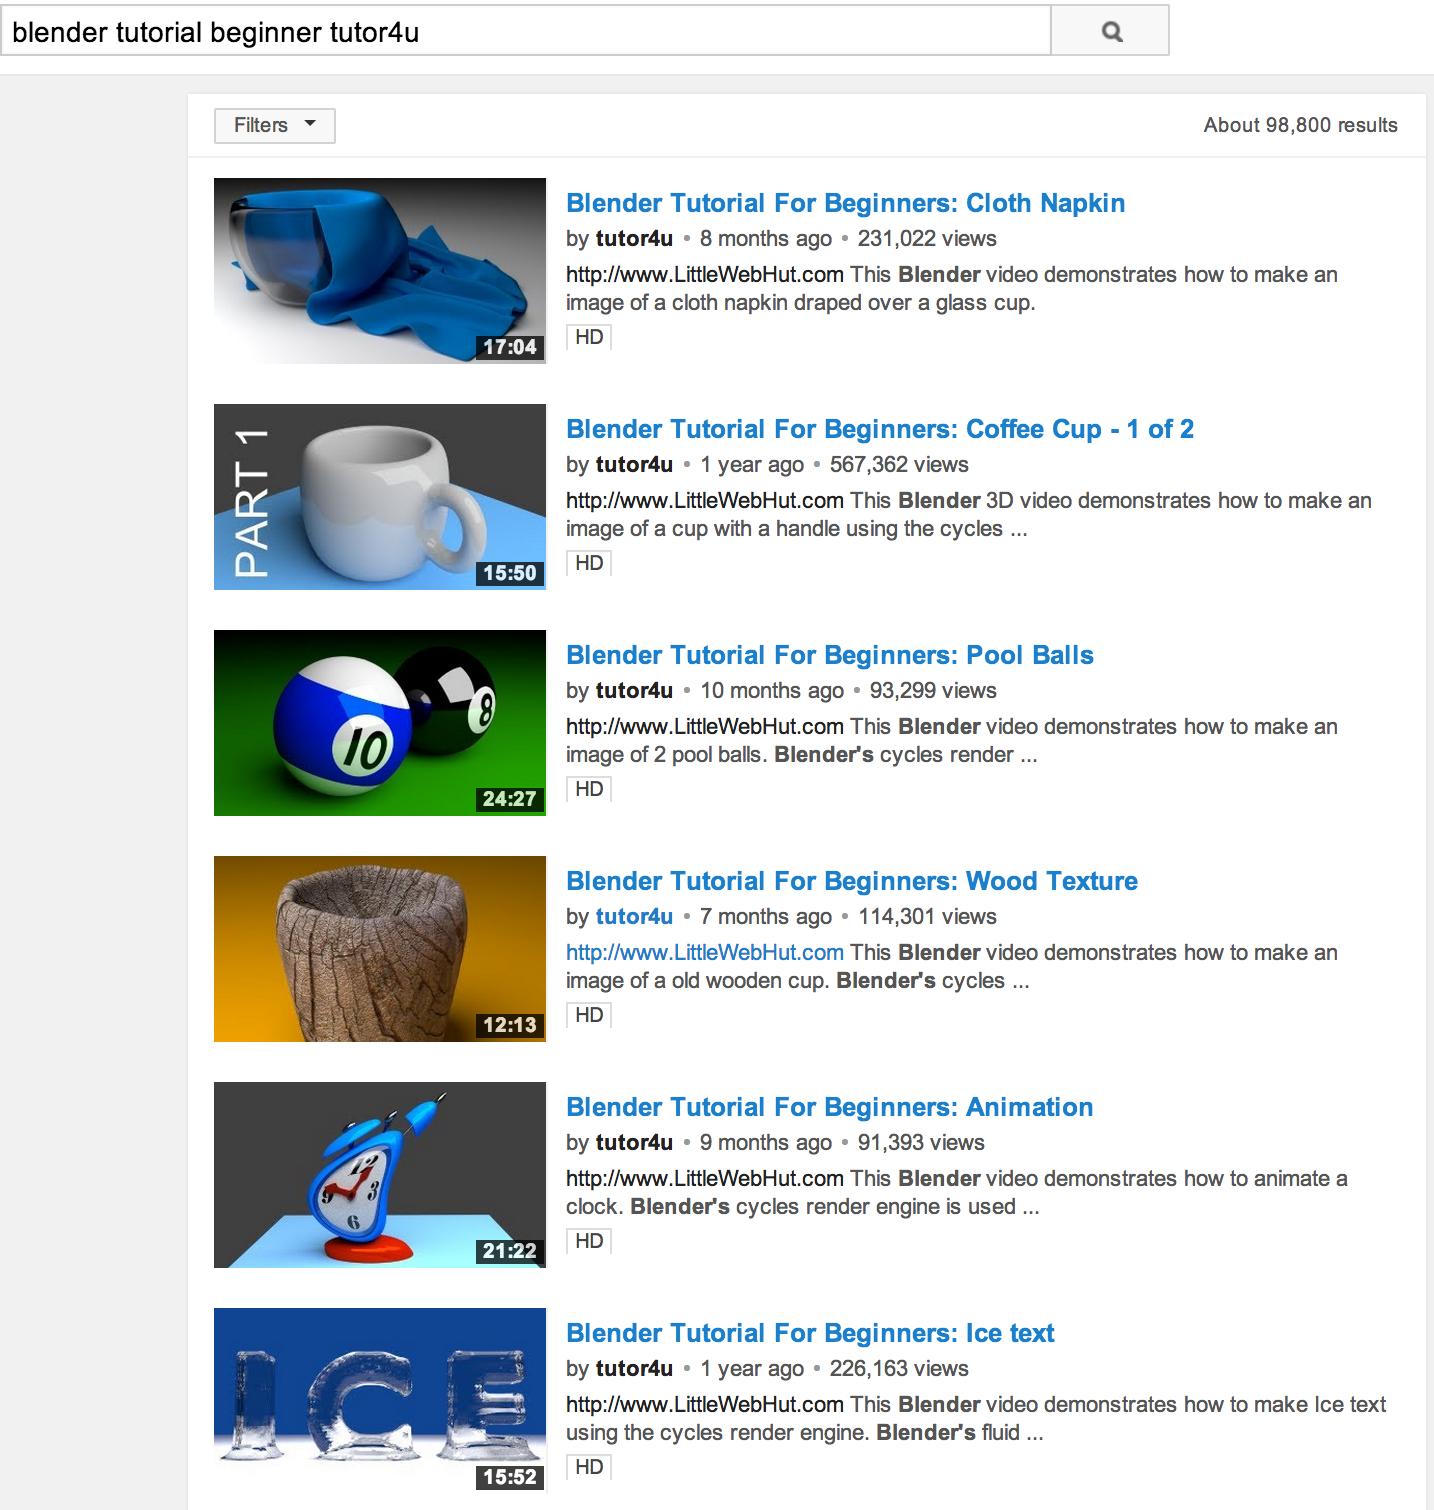 Blender tutorial beginner by tutor4u https//www.youtube